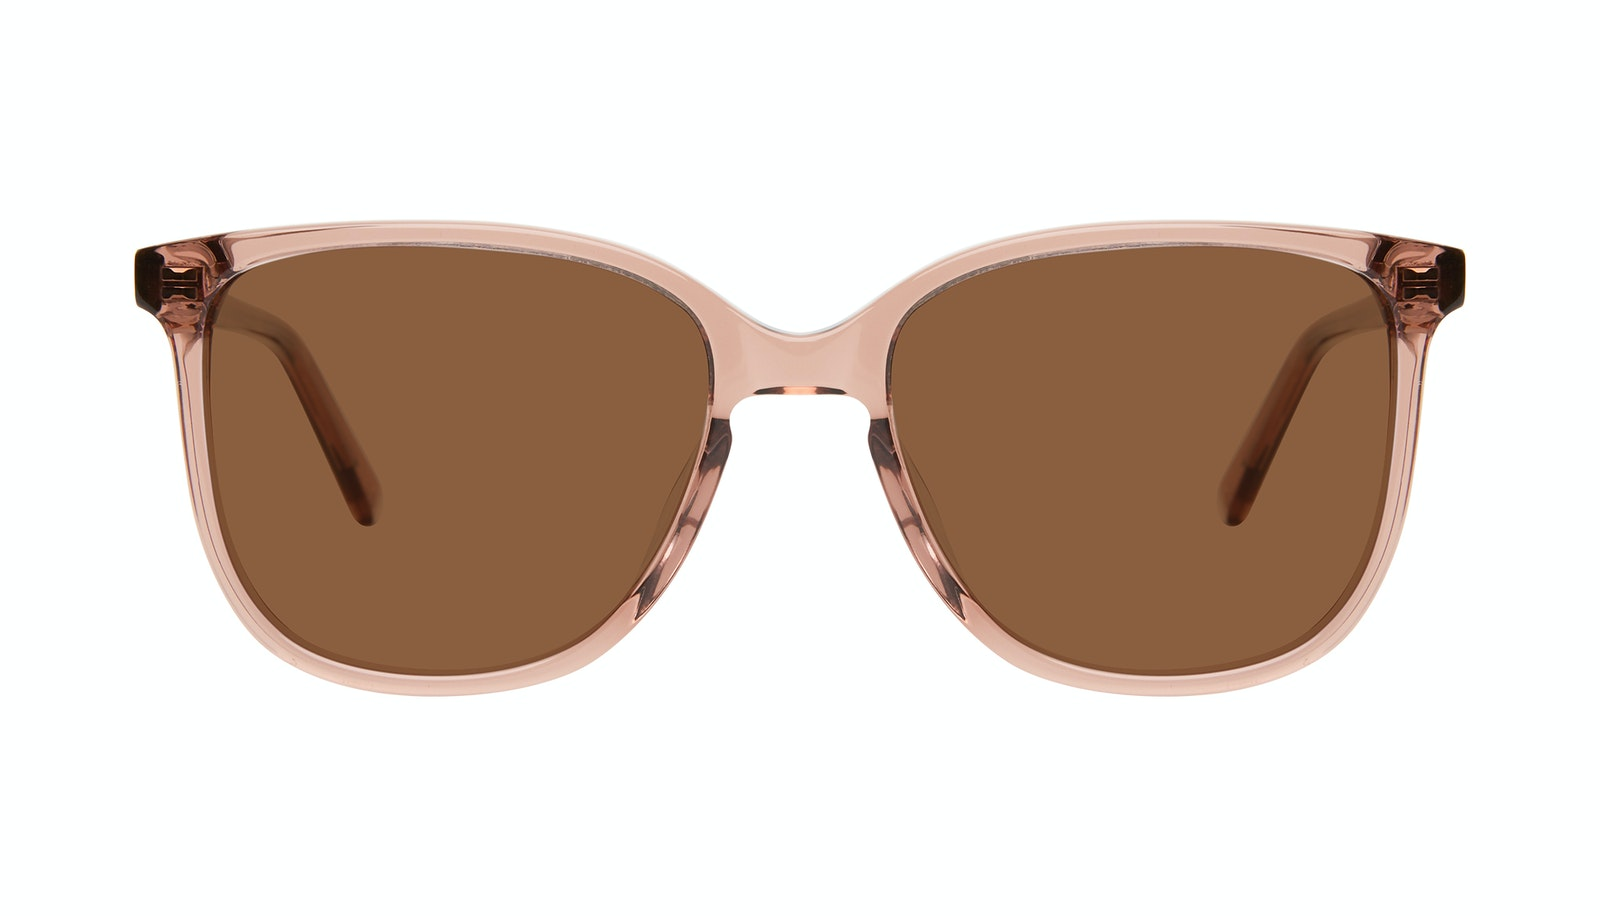 Affordable Fashion Glasses Square Sunglasses Women Lead Rose